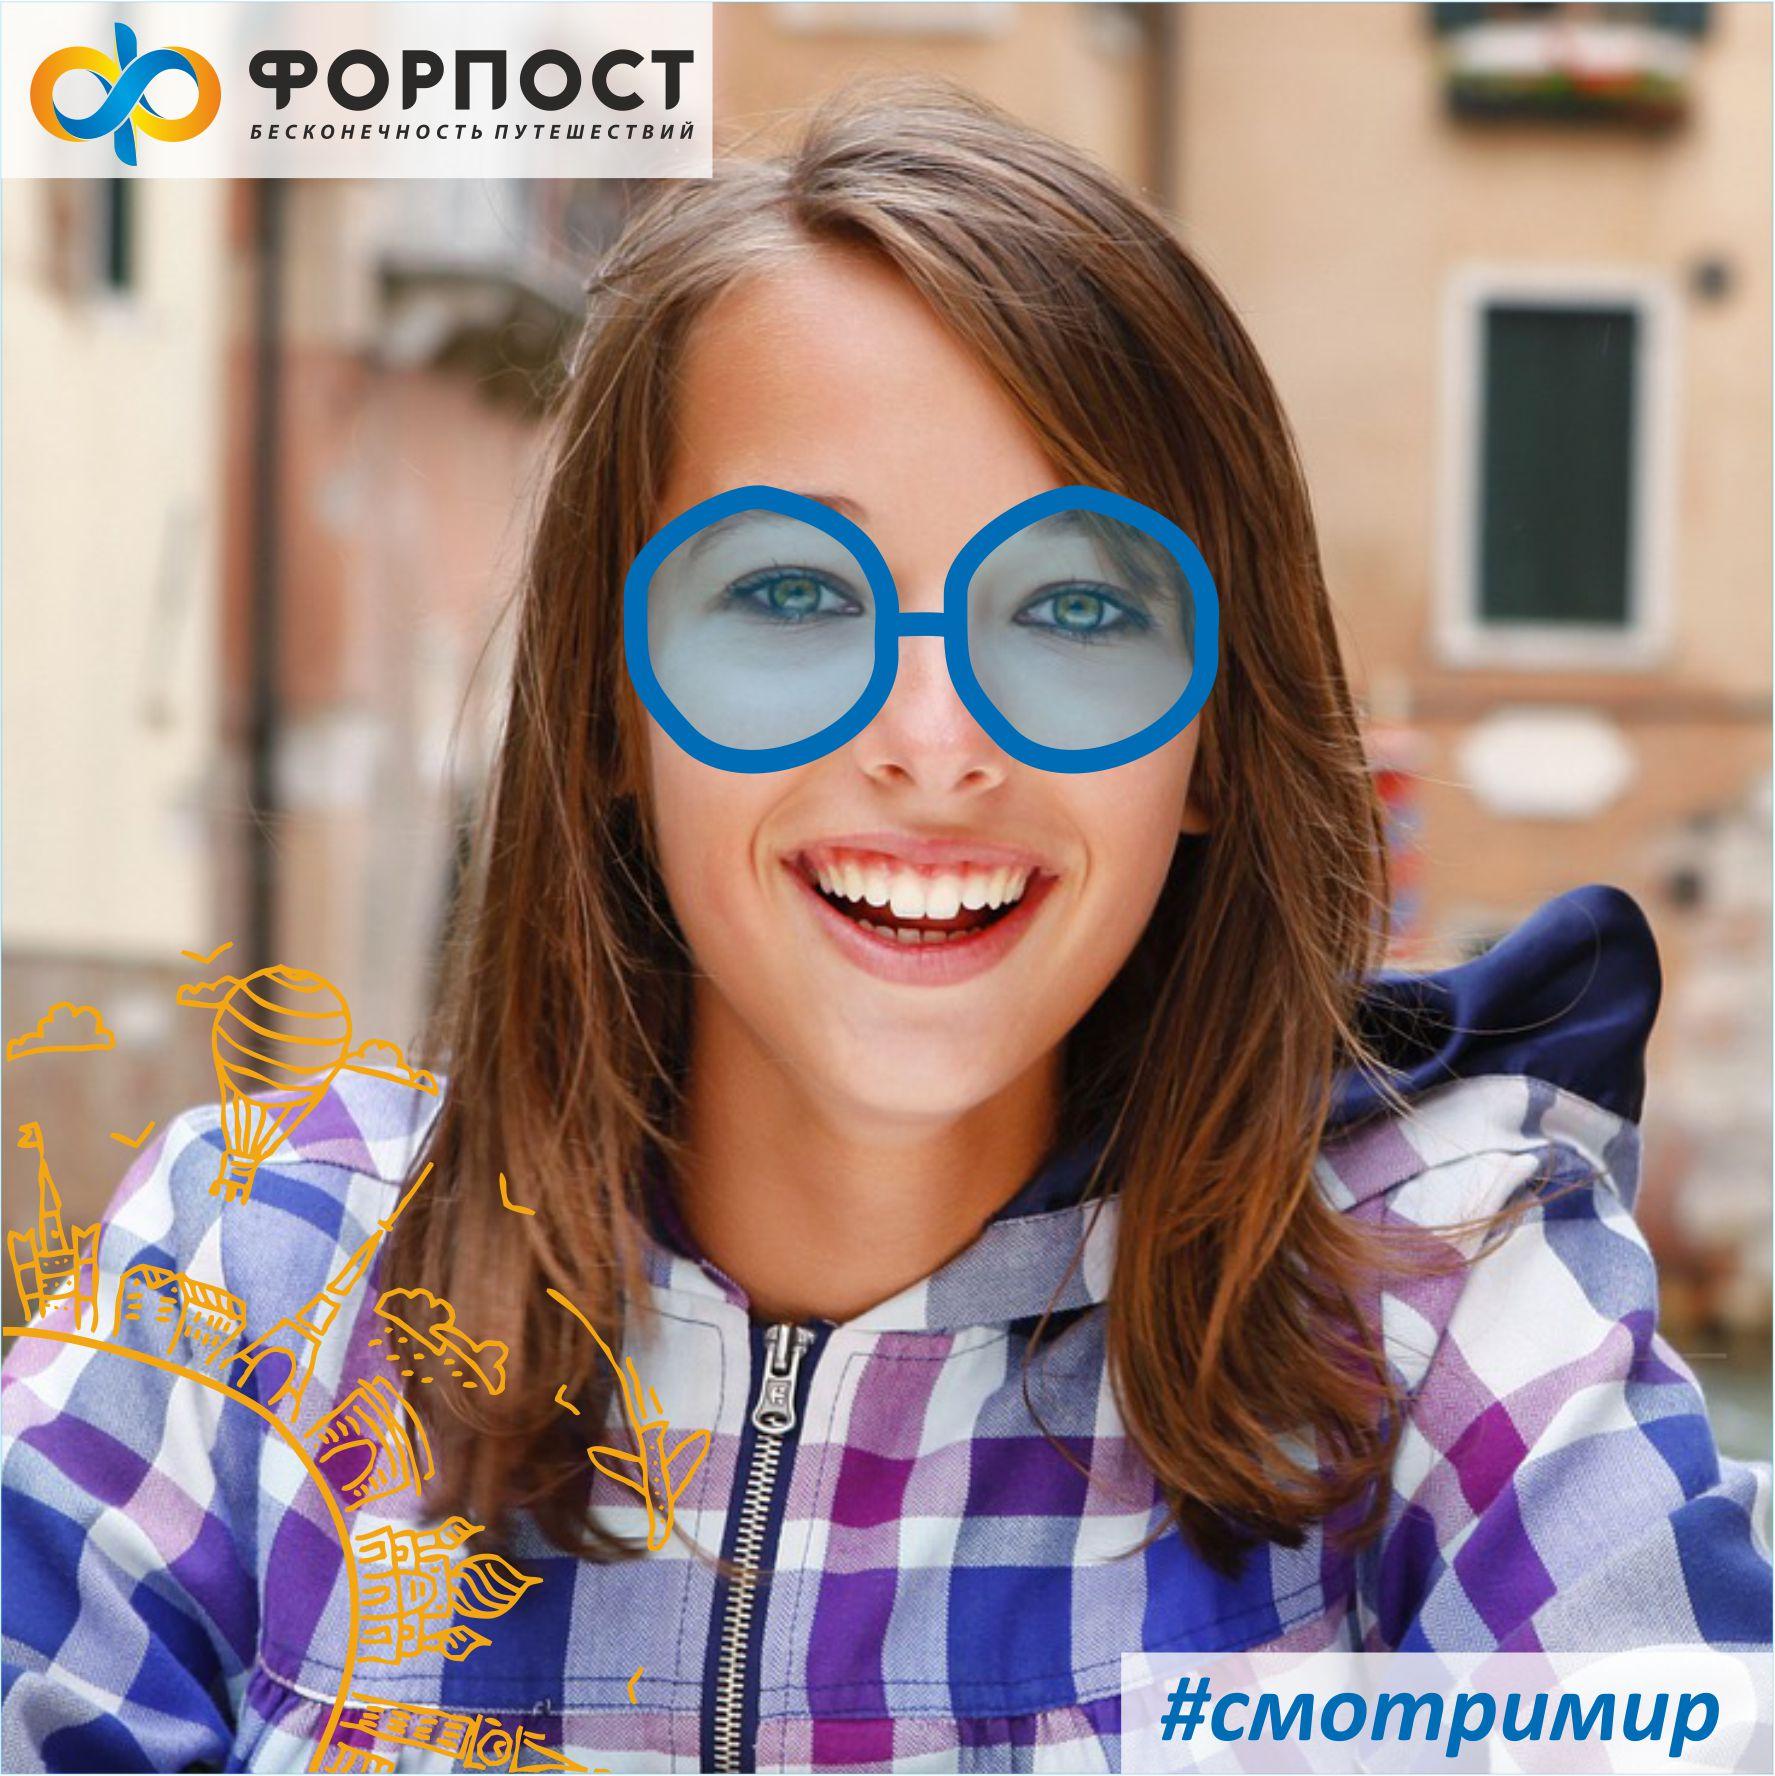 Дизайн флаера на прозрачном пластике фото f_6785ba3a1e71f5d1.jpg